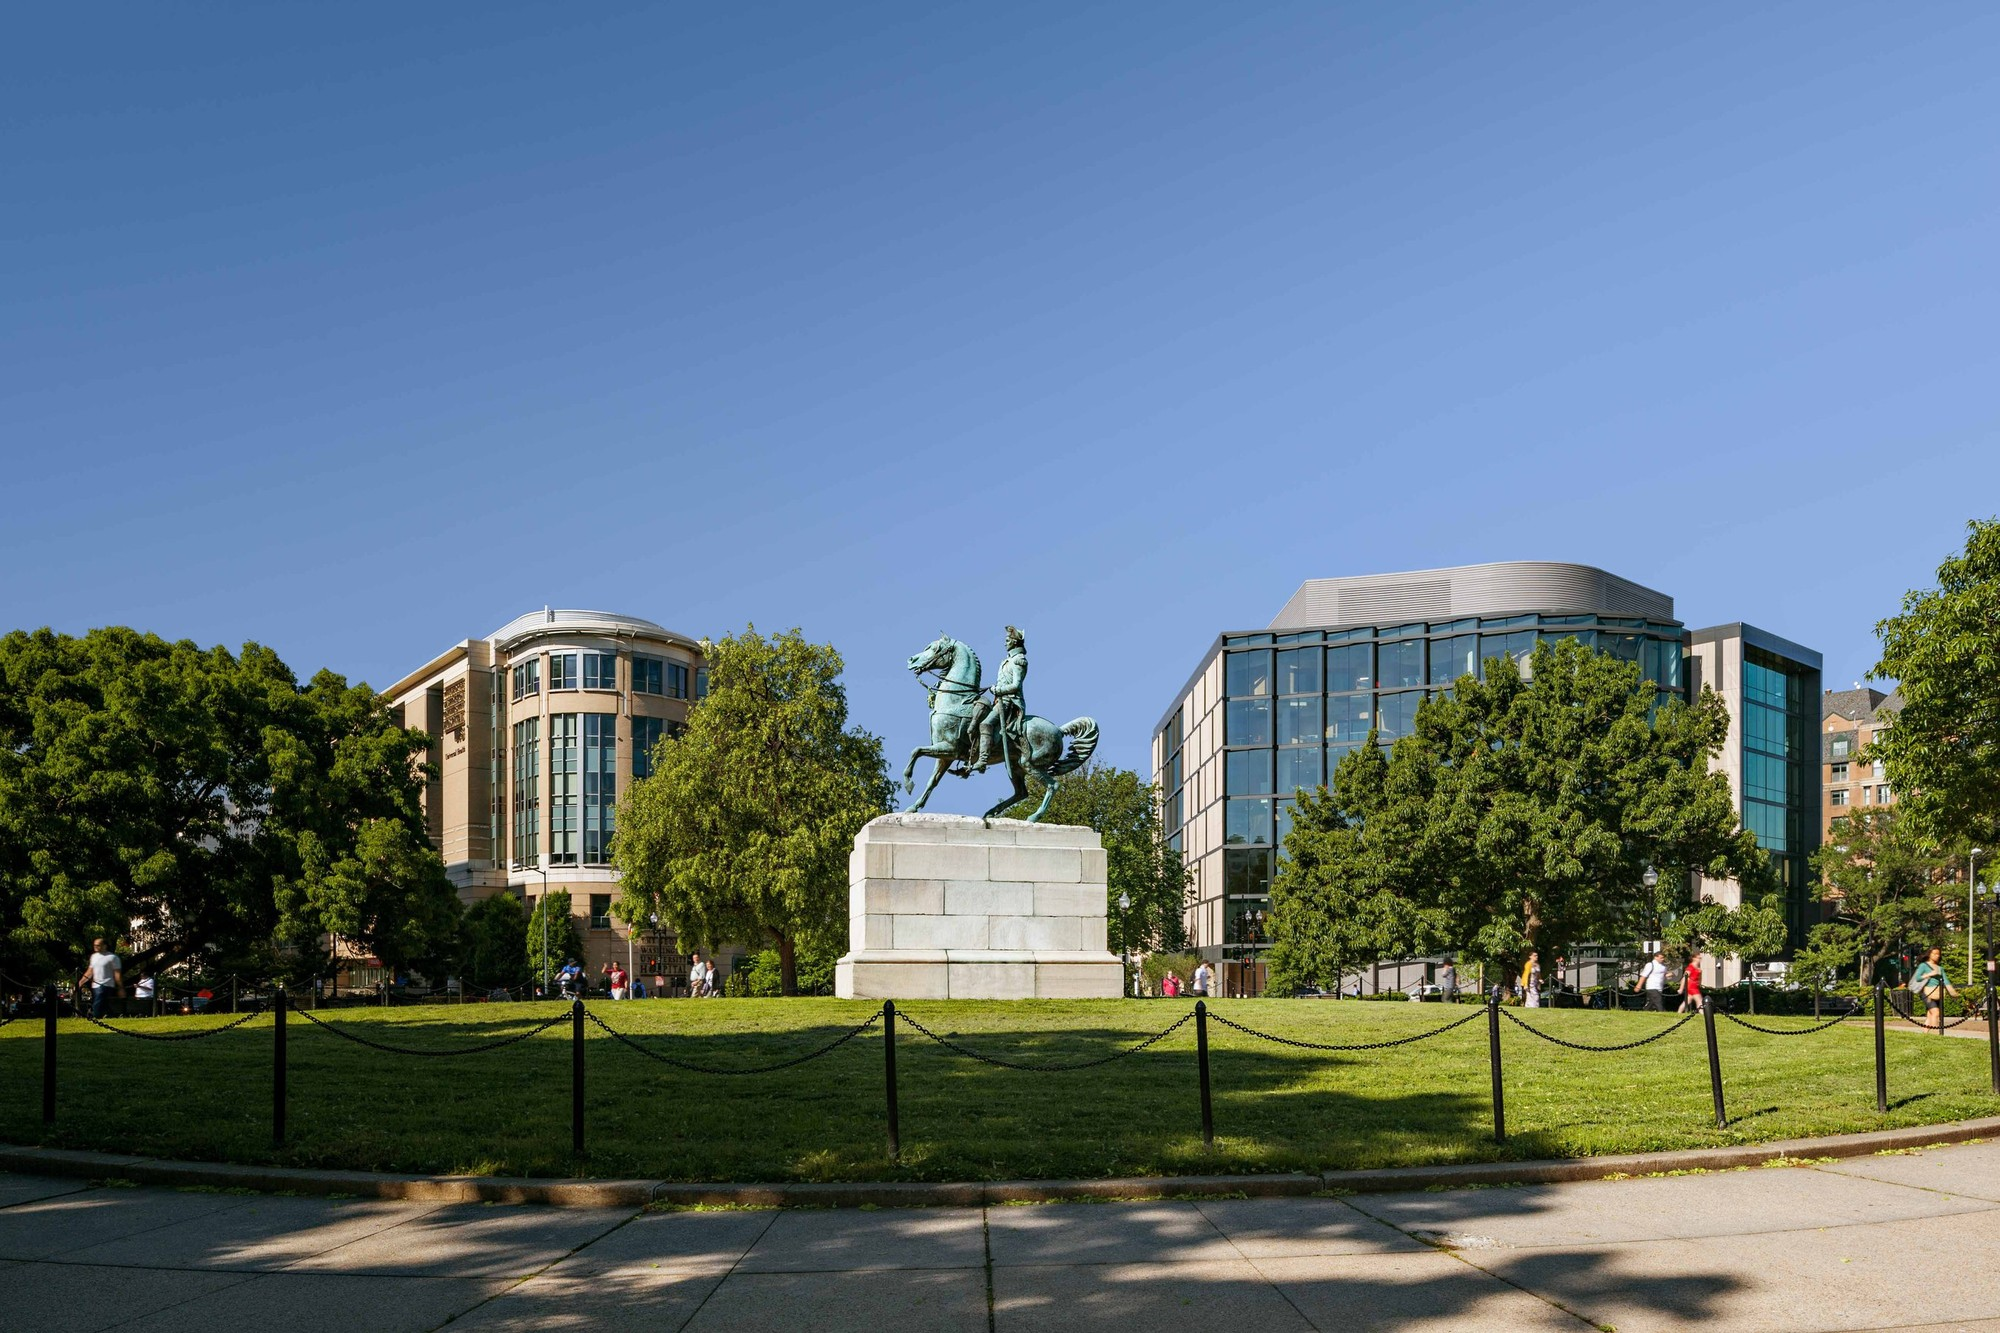 Statue of Lieutenant General George Washington on the GWU campus